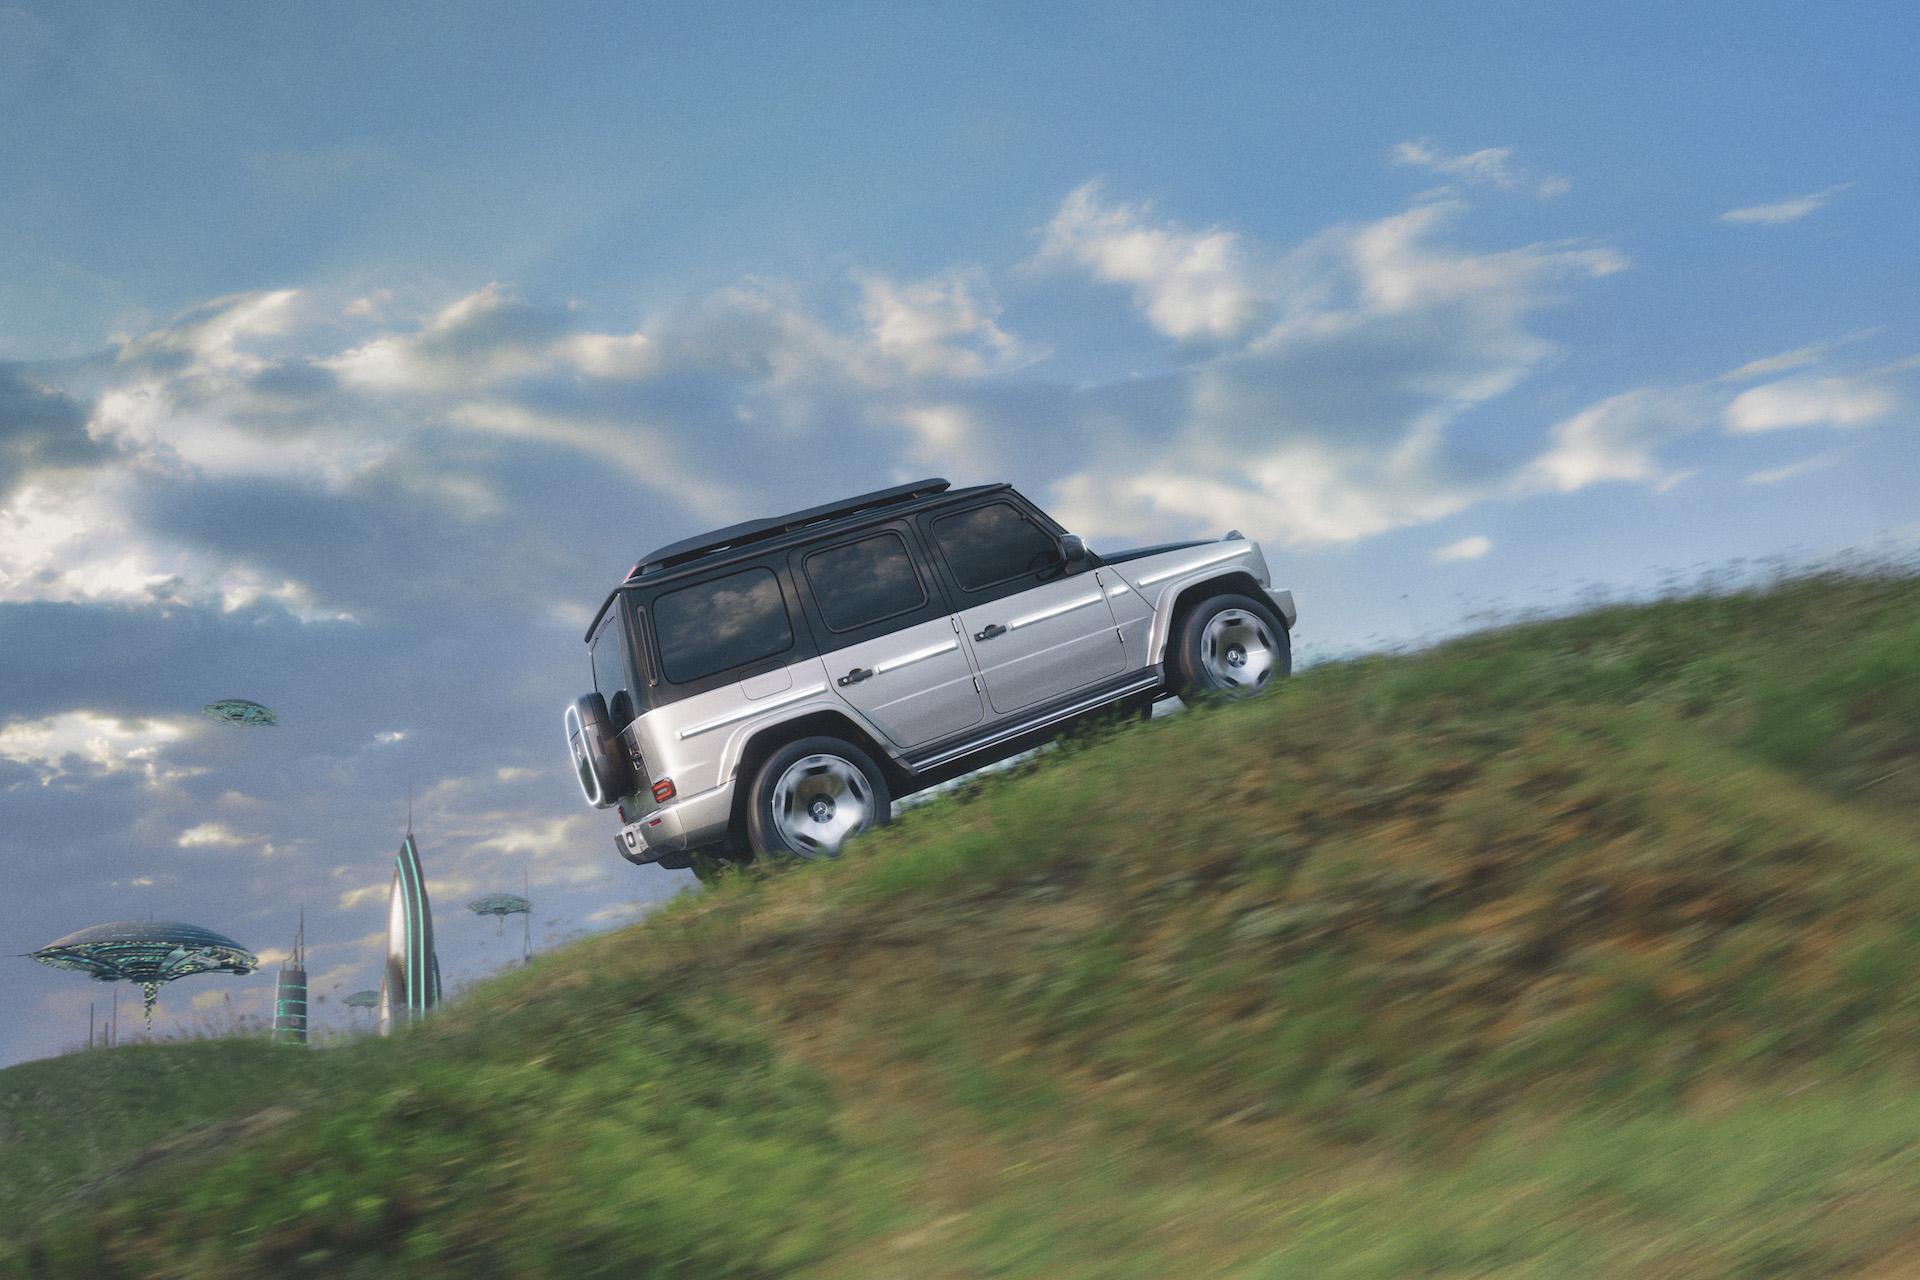 Polestar 2 review, Mercedes EQE, Toyota battery plan, Hyundai hydrogen vision: The Week in Reverse